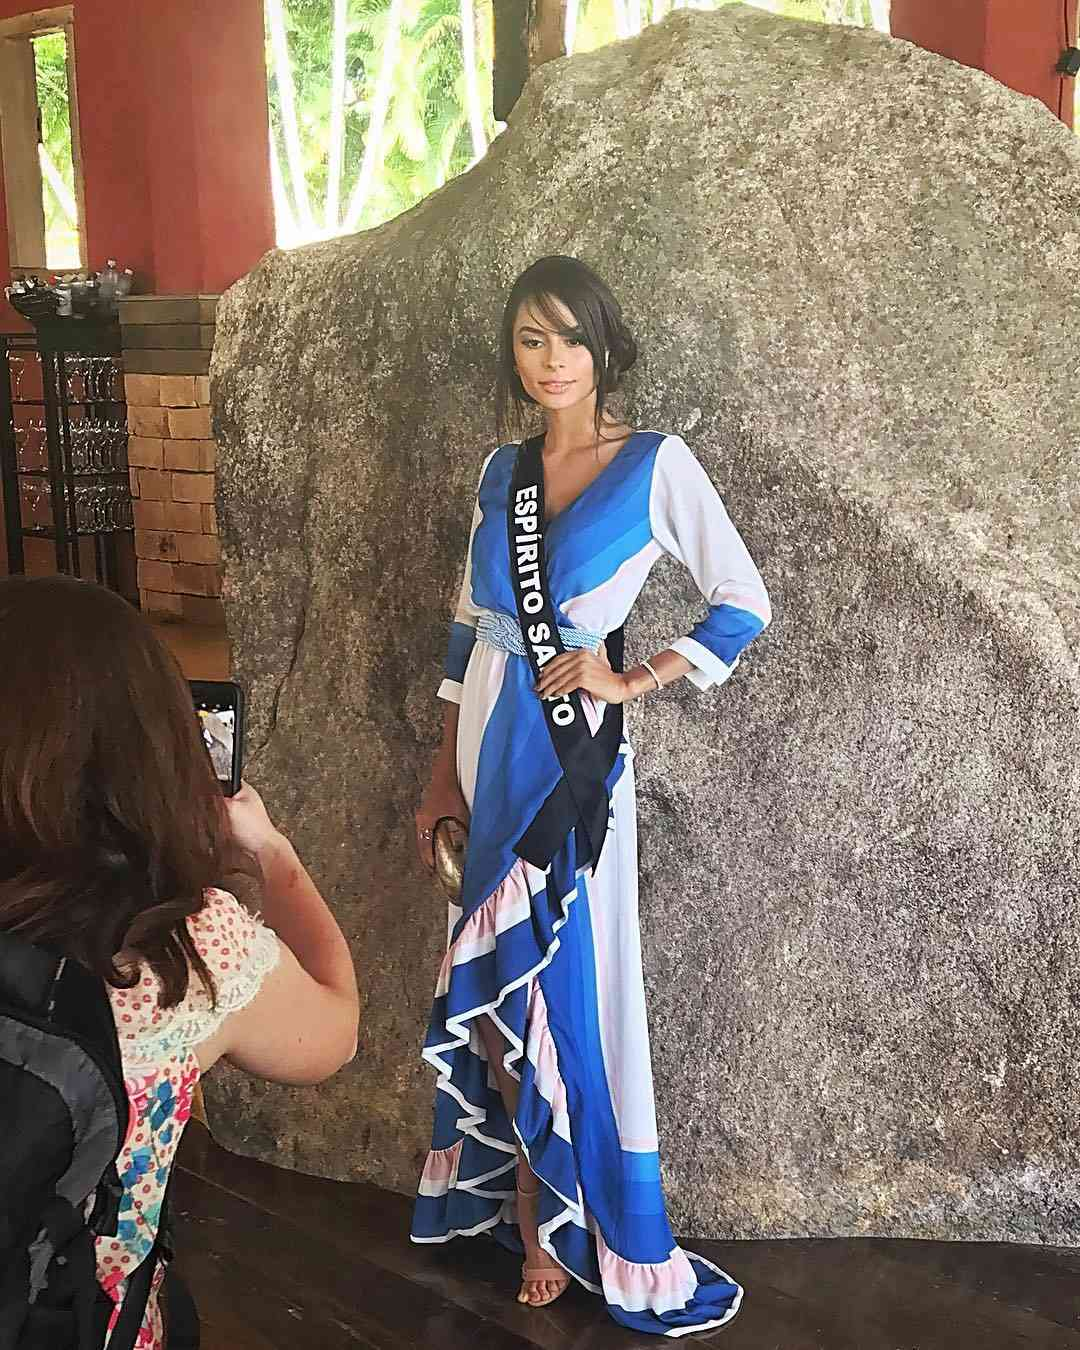 stephany pim, miss eco brasil 2017/top 3 de miss brasil universo 2017. - Página 10 20687313